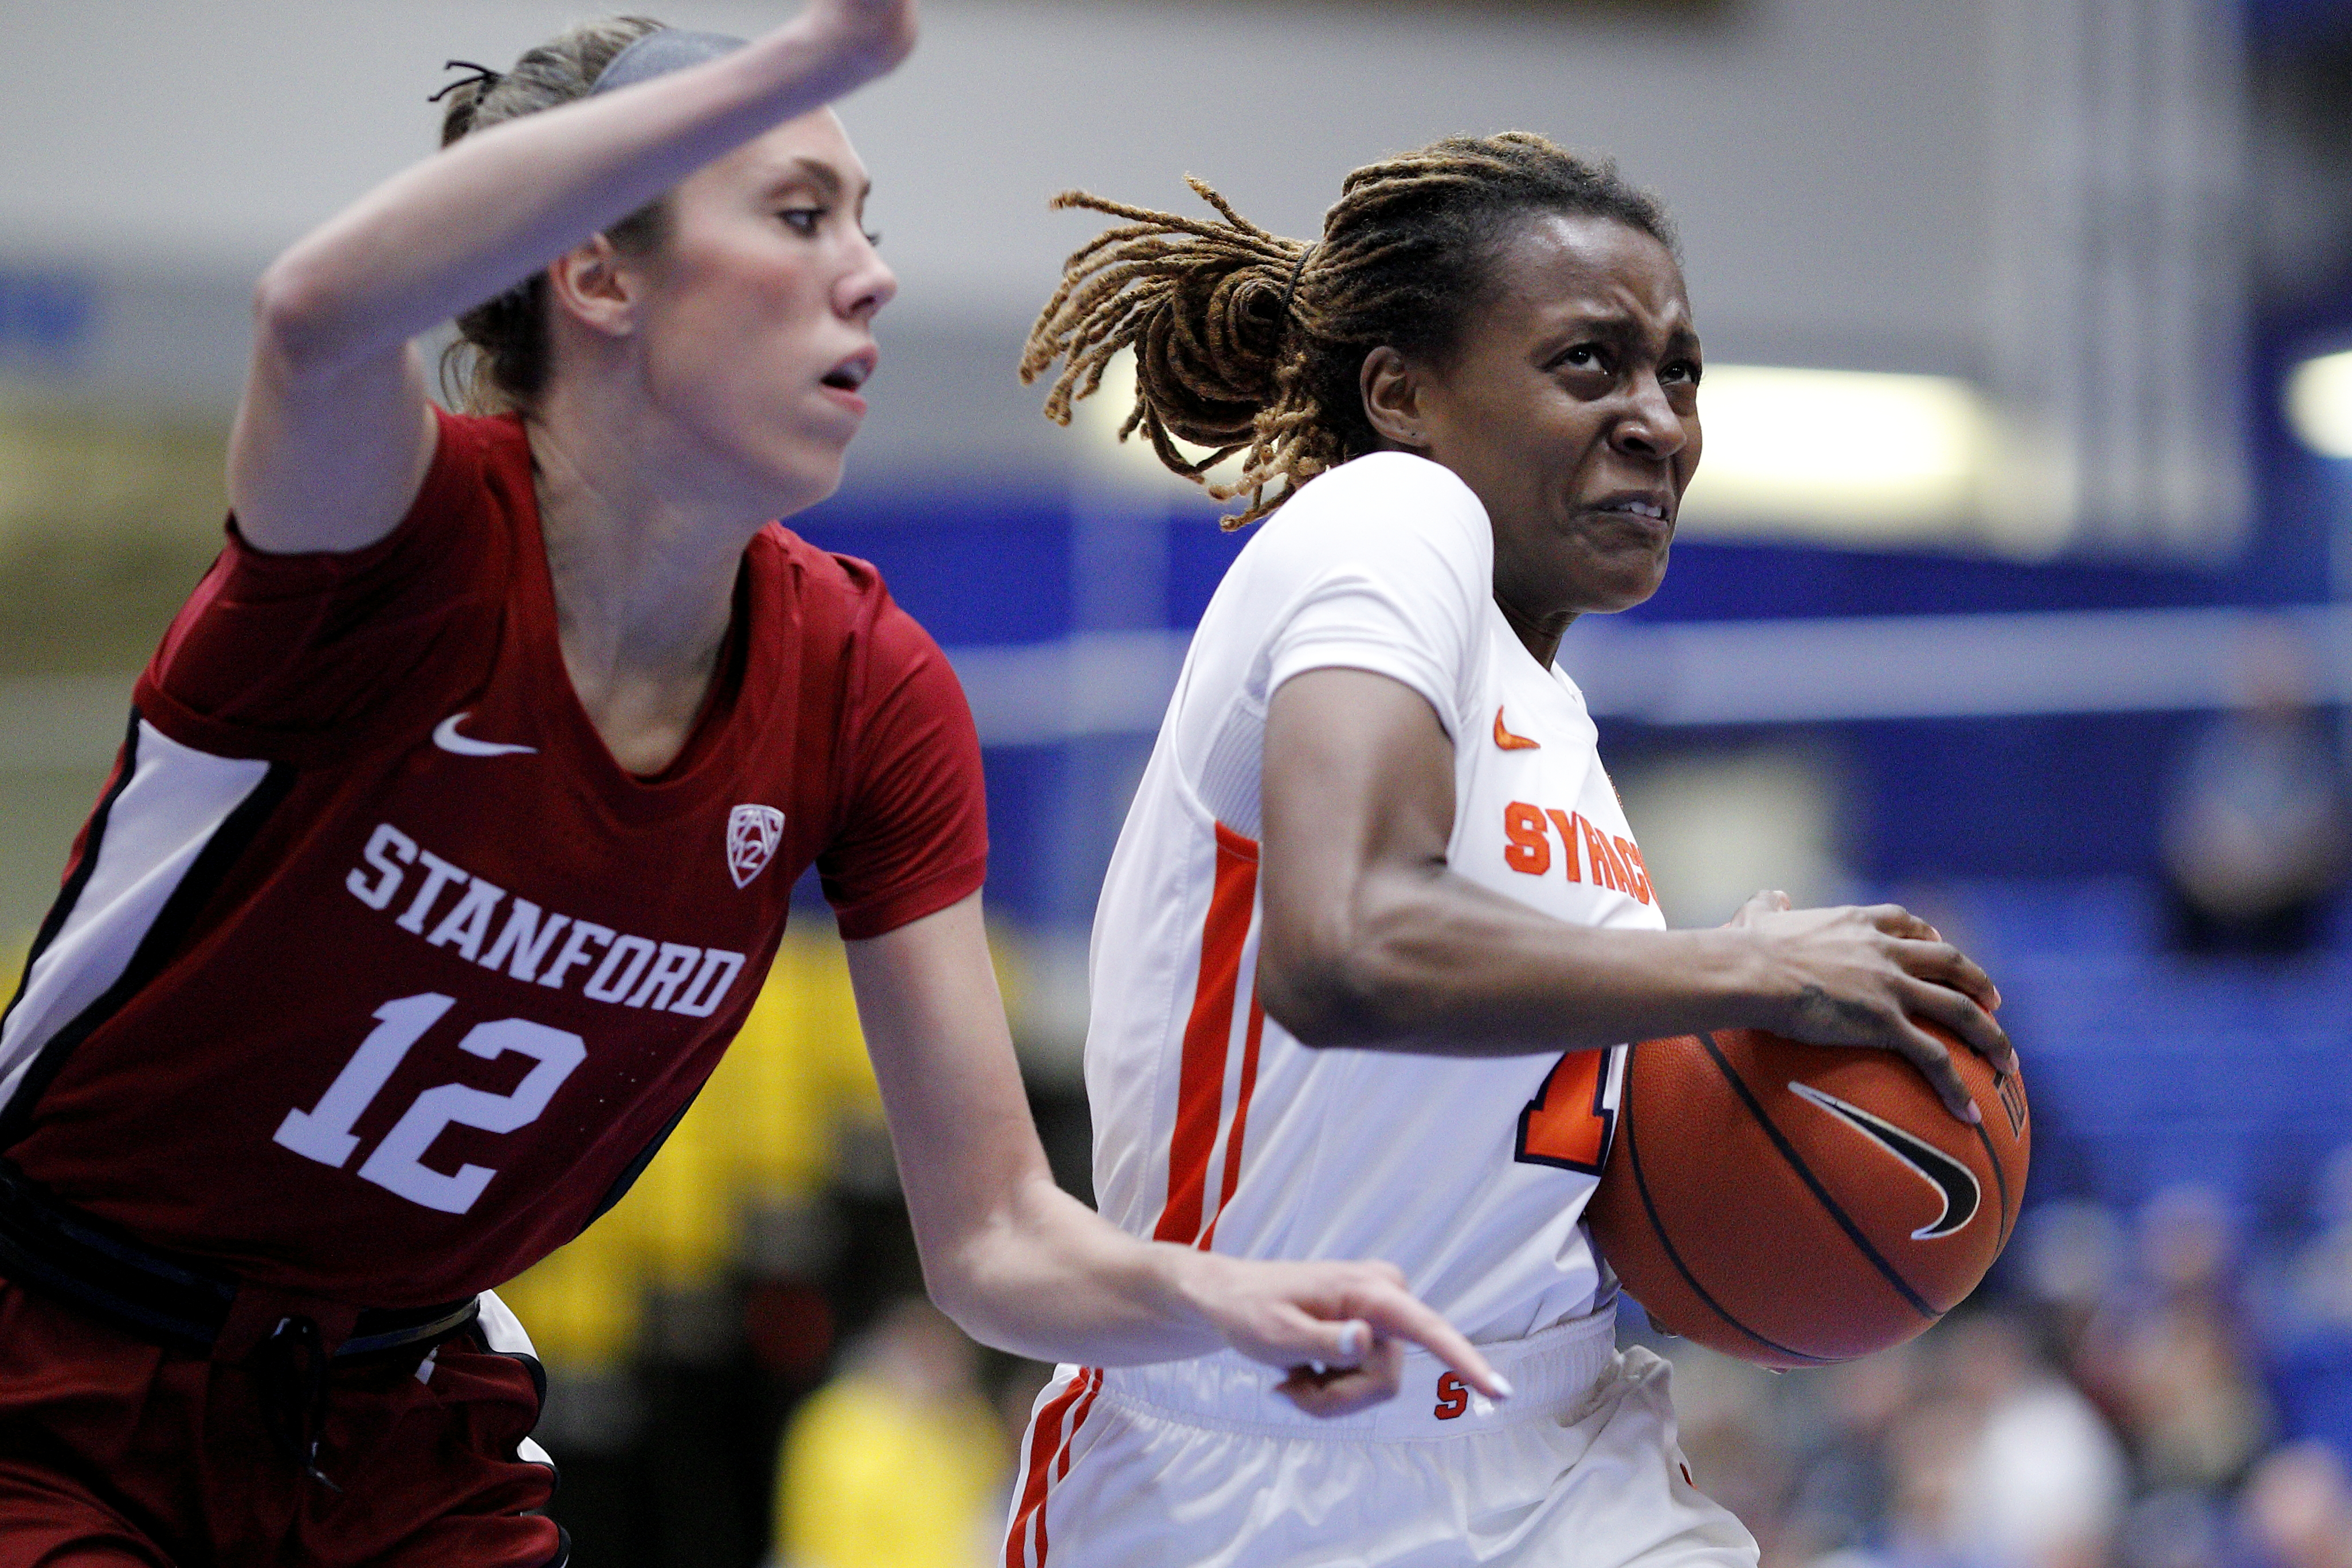 Syracuse v Stanford: Greater Victoria Invitational